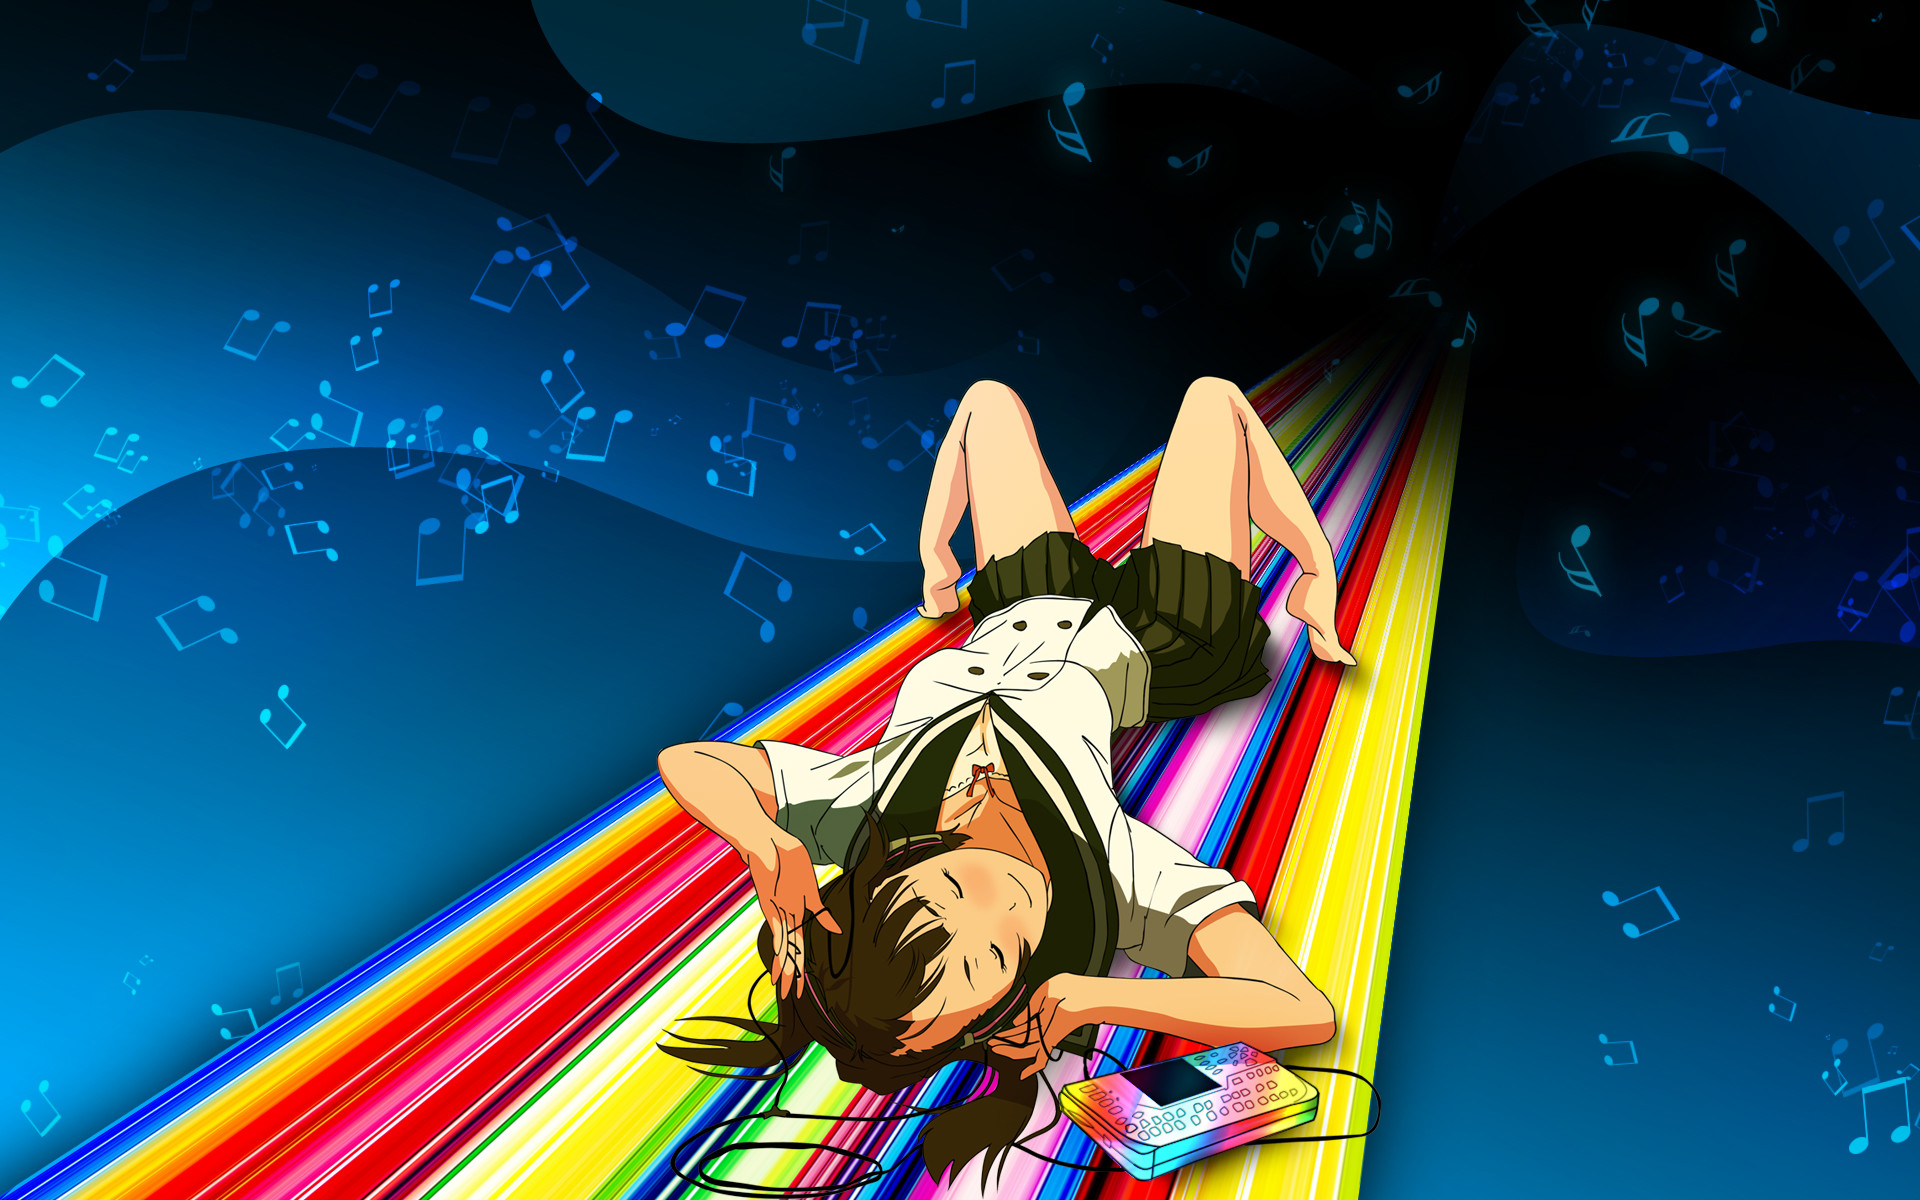 Anime Music Wallpaper Stylish Anime Photos 23320wall.jpg